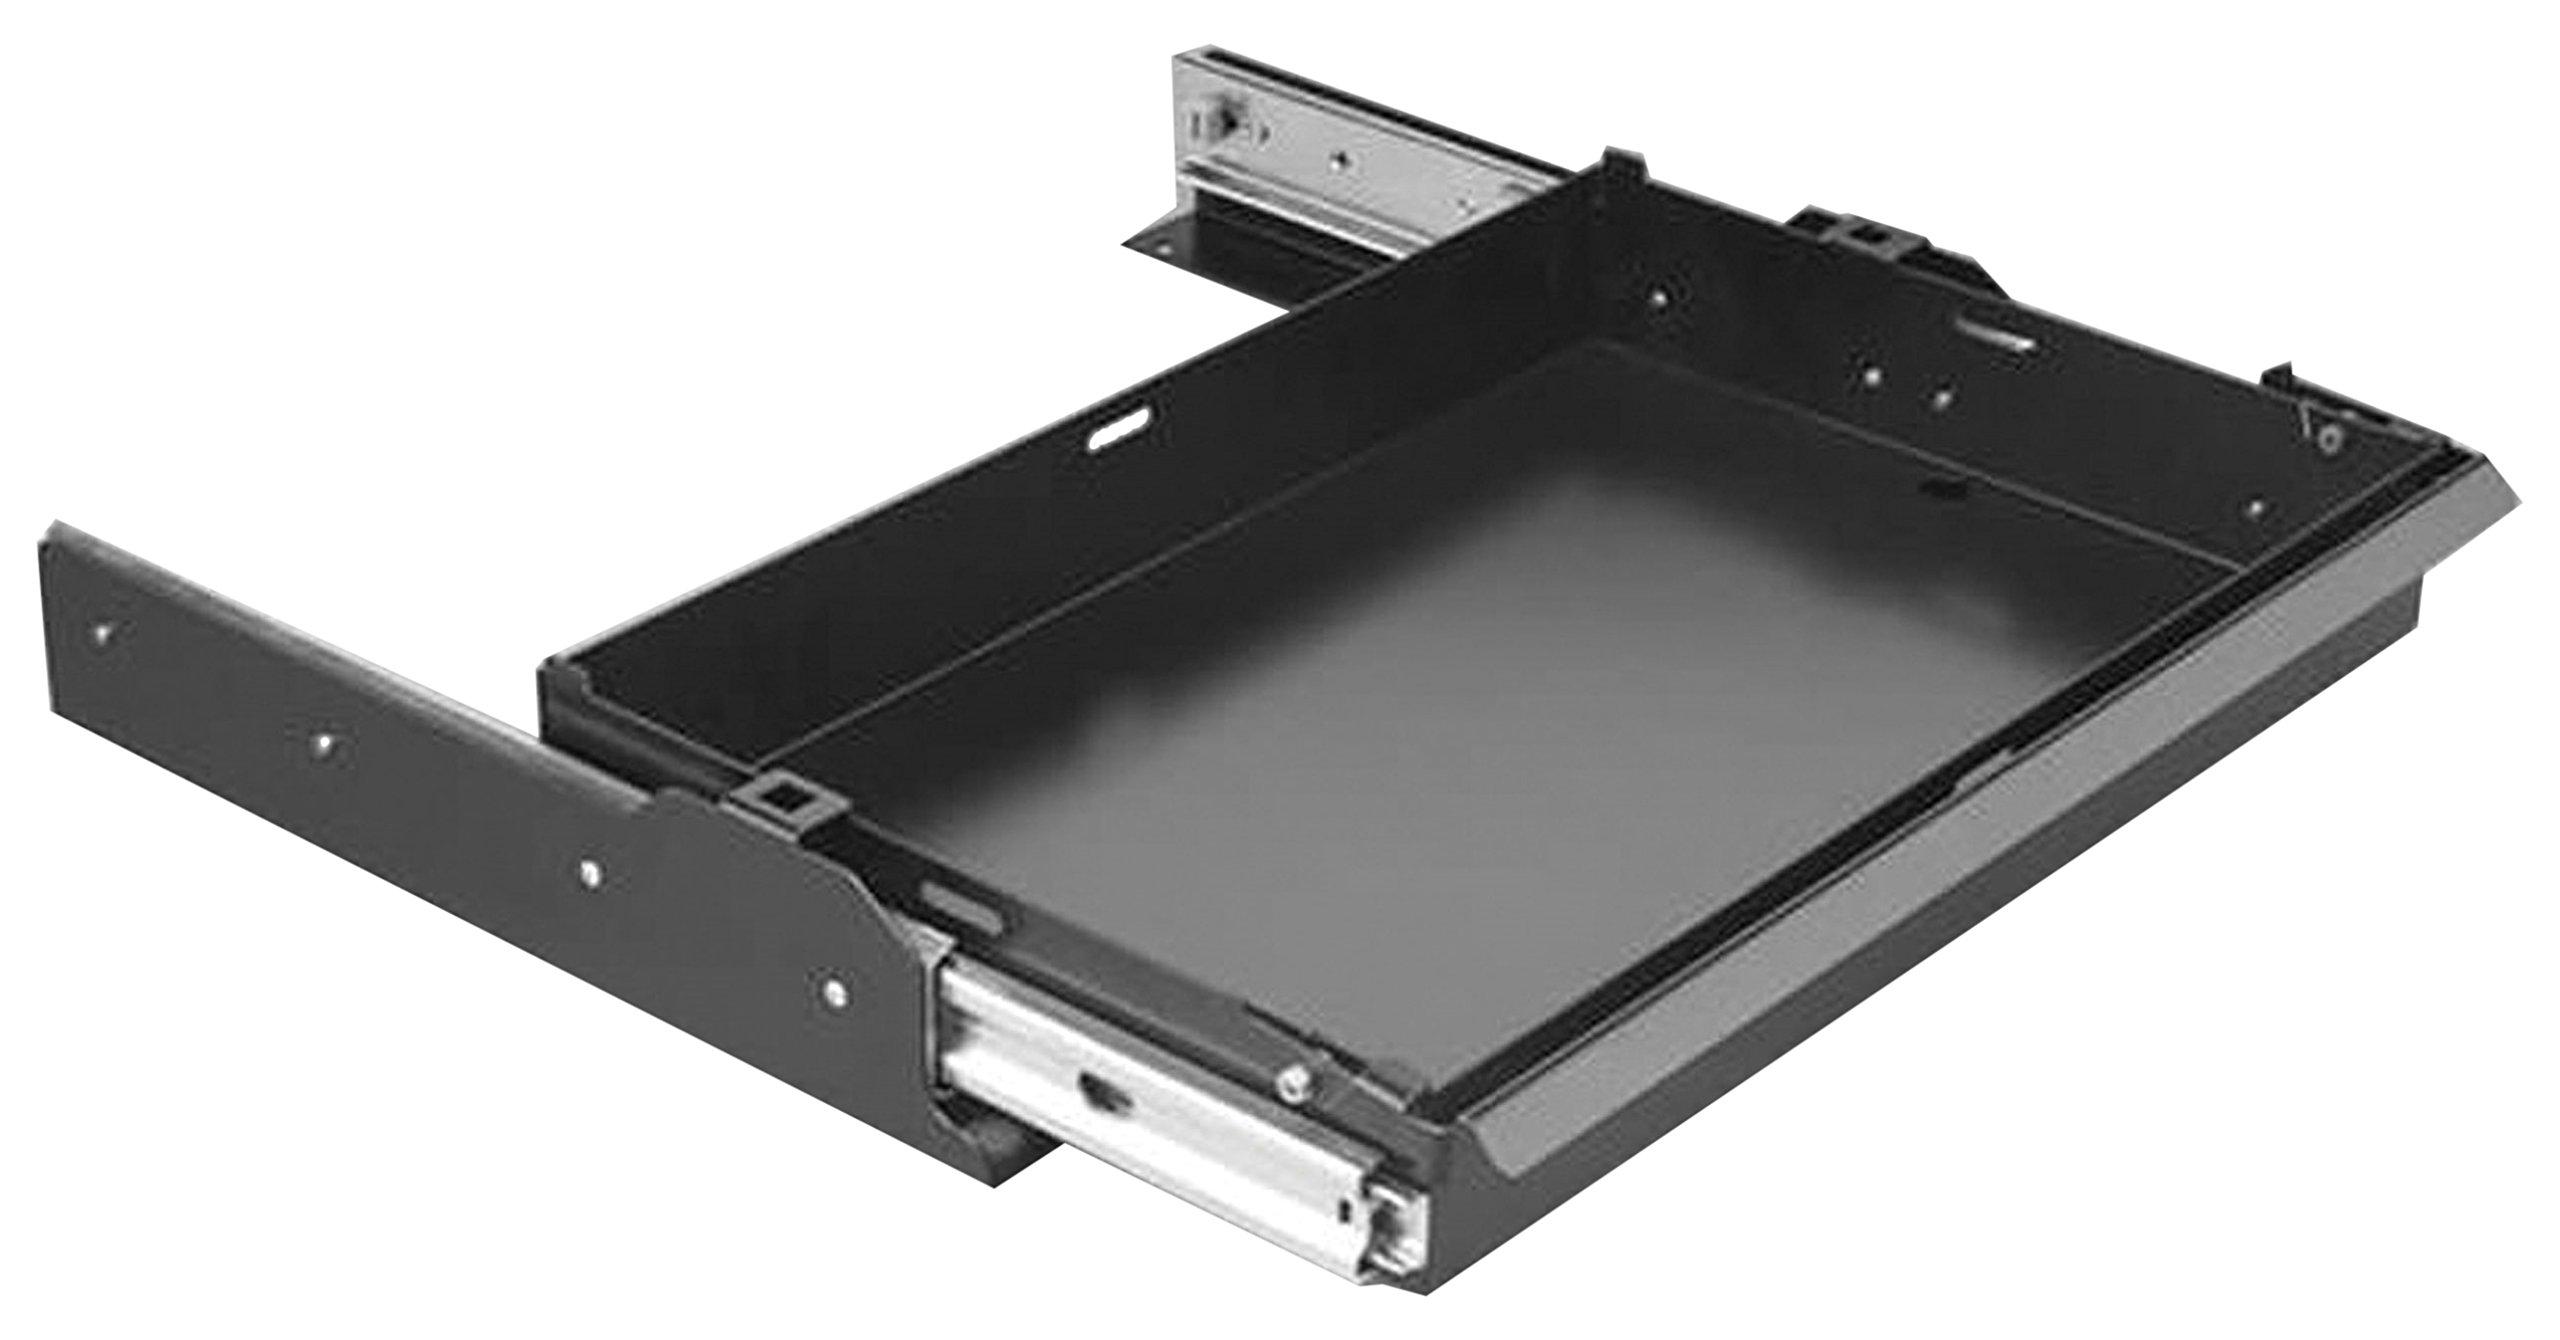 MORryde SP60-044 Sliding Battery Tray - 24.25'' x 24.15'' x 2.75'' by MOR/ryde